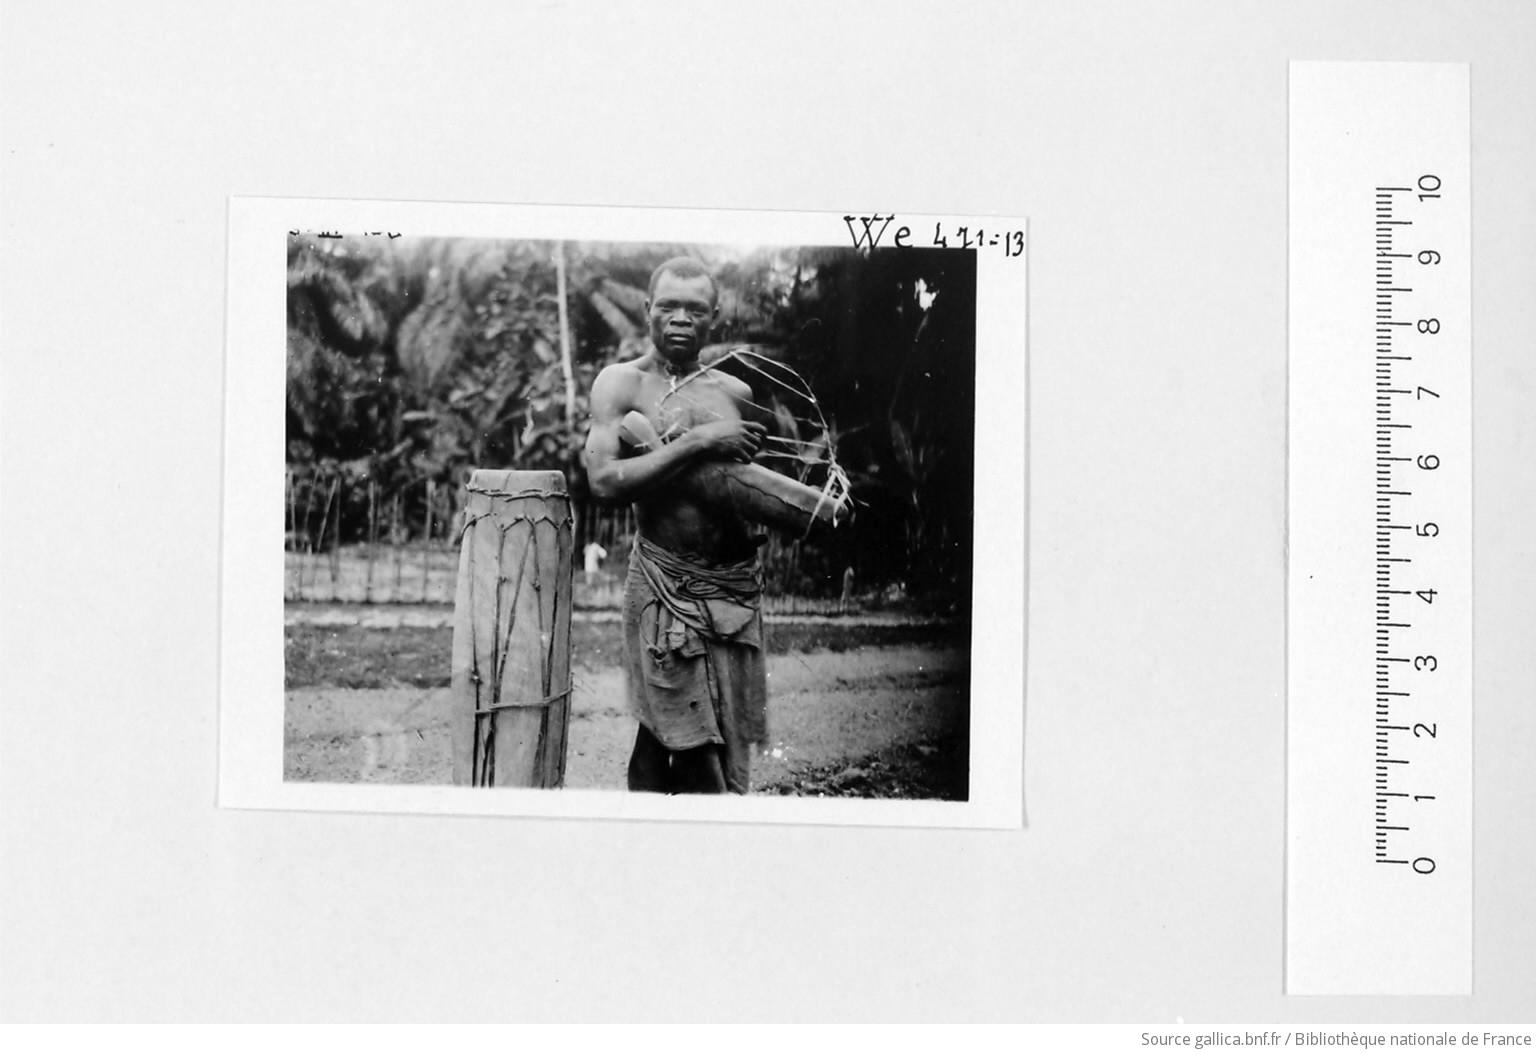 [39 phot. d'A.E.F. en 1924. Enregistré en 1936] - 13